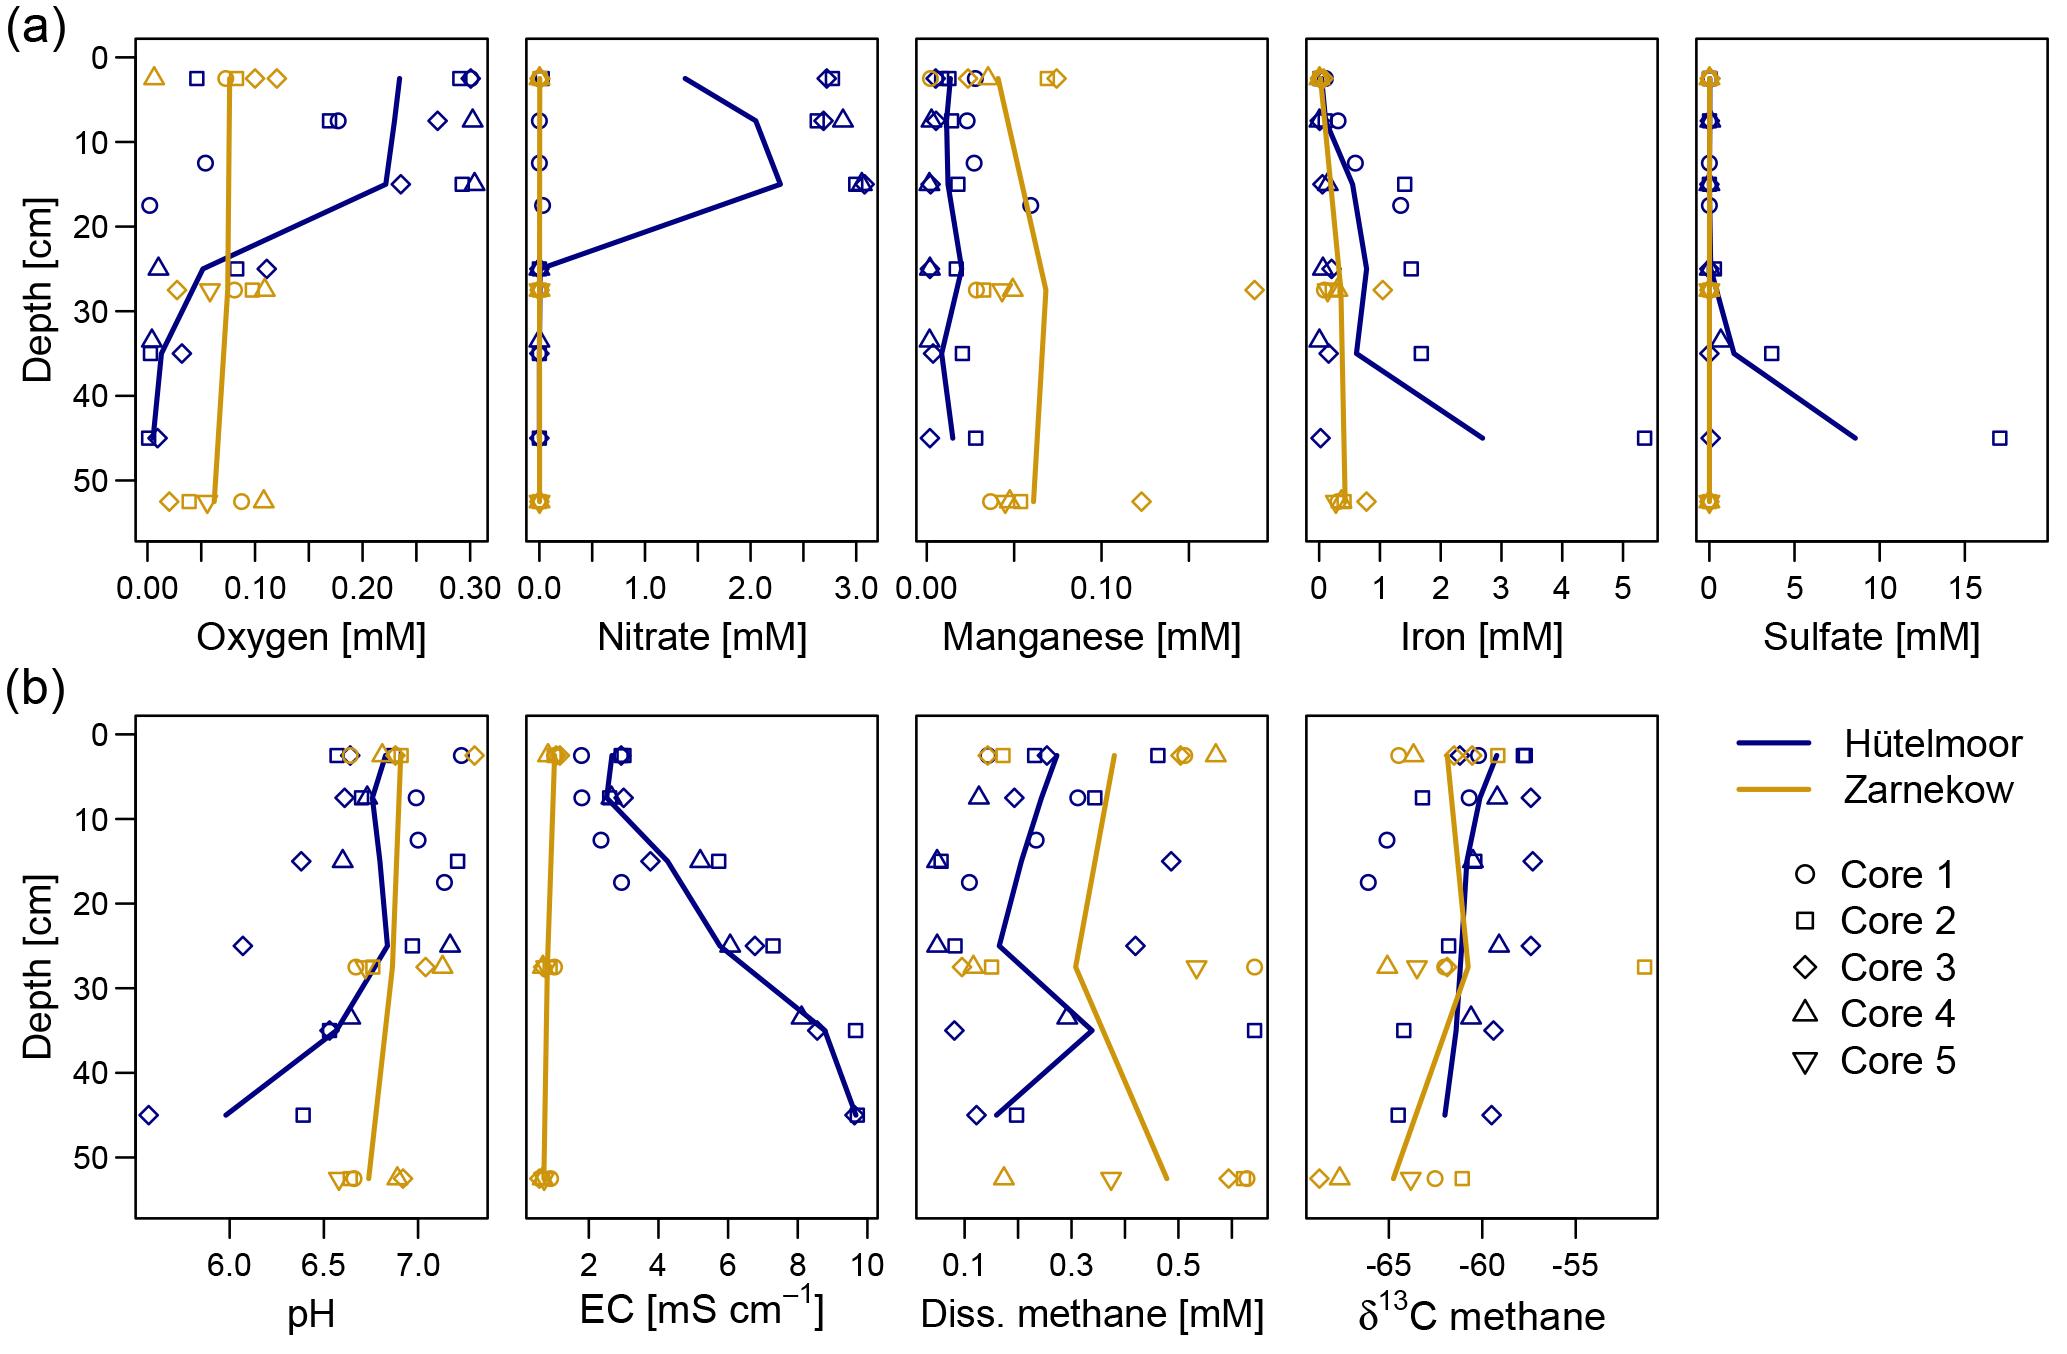 BG - Predominance of methanogens over methanotrophs in rewetted fens ...